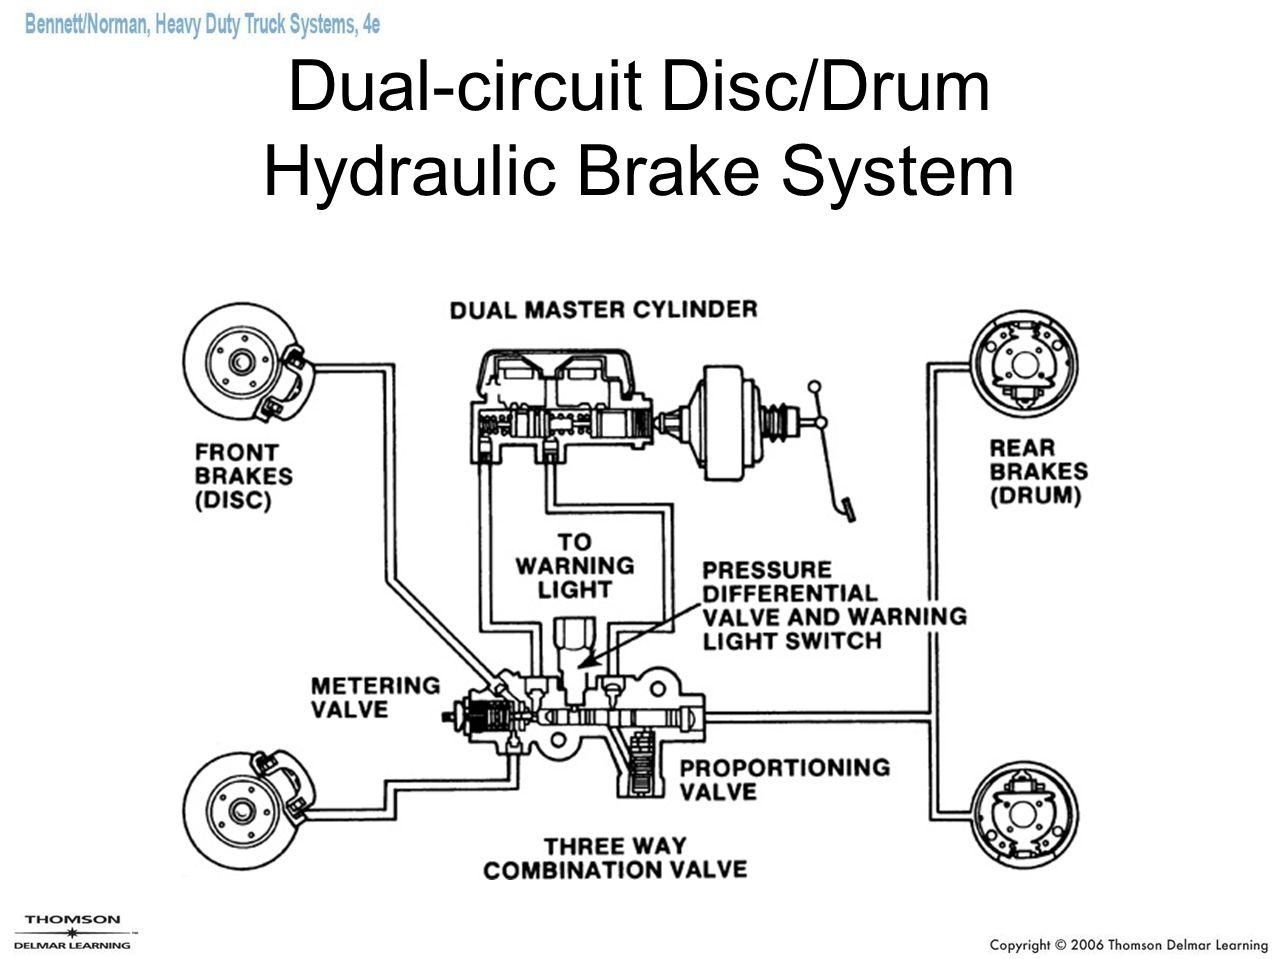 Dual-circuit Disc/Drum Hydraulic Brake System